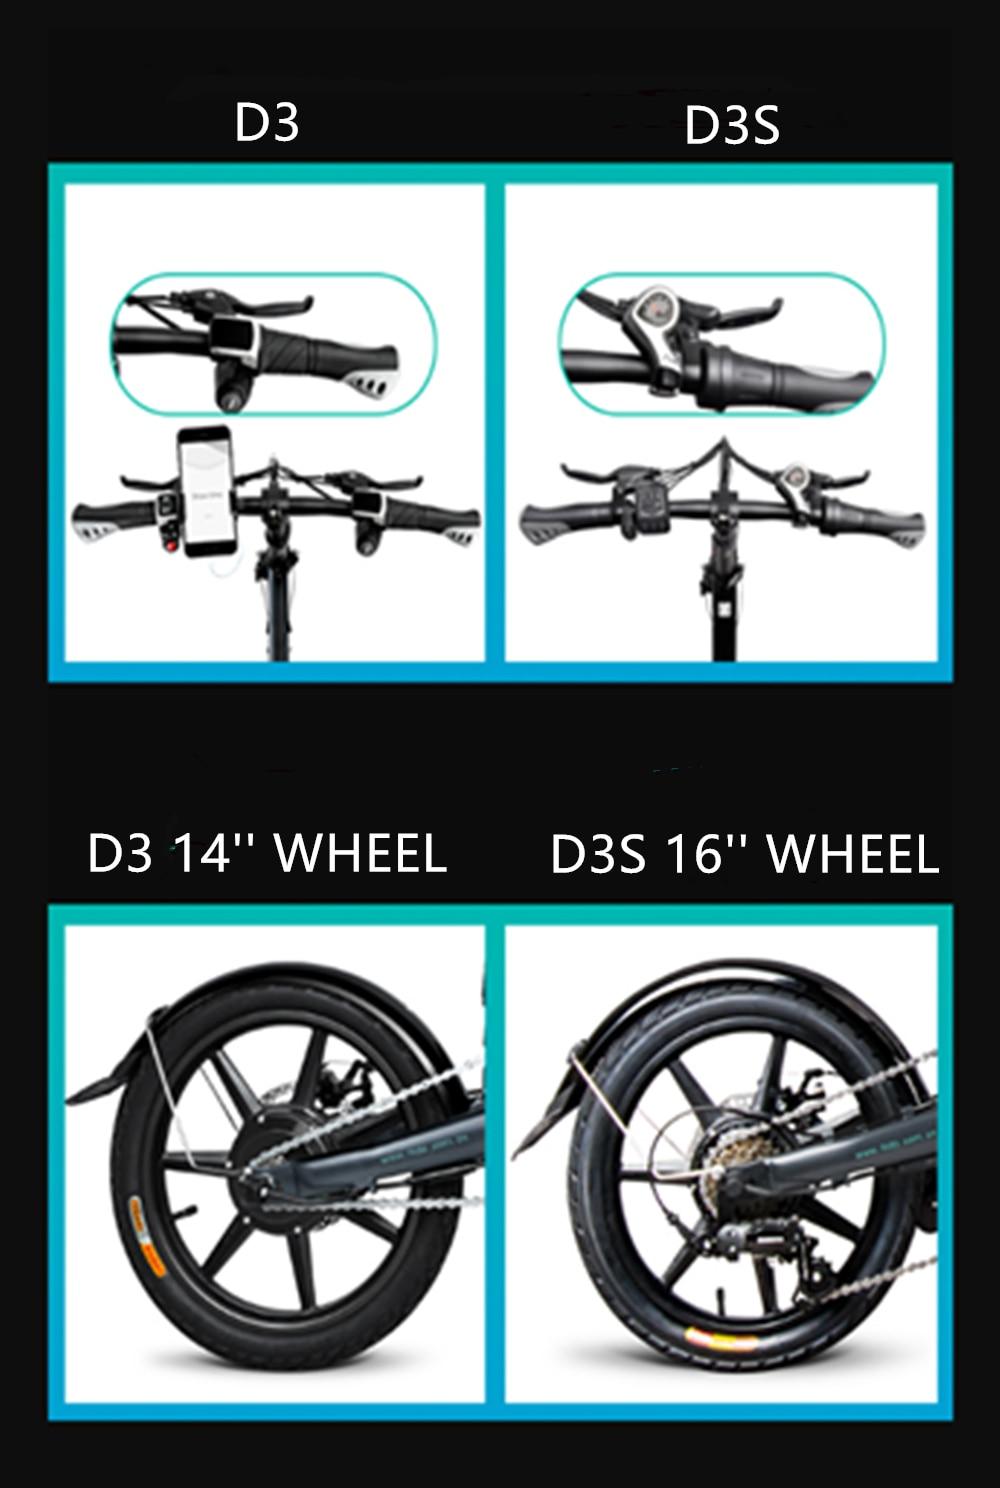 D3S D3 区别图_副本